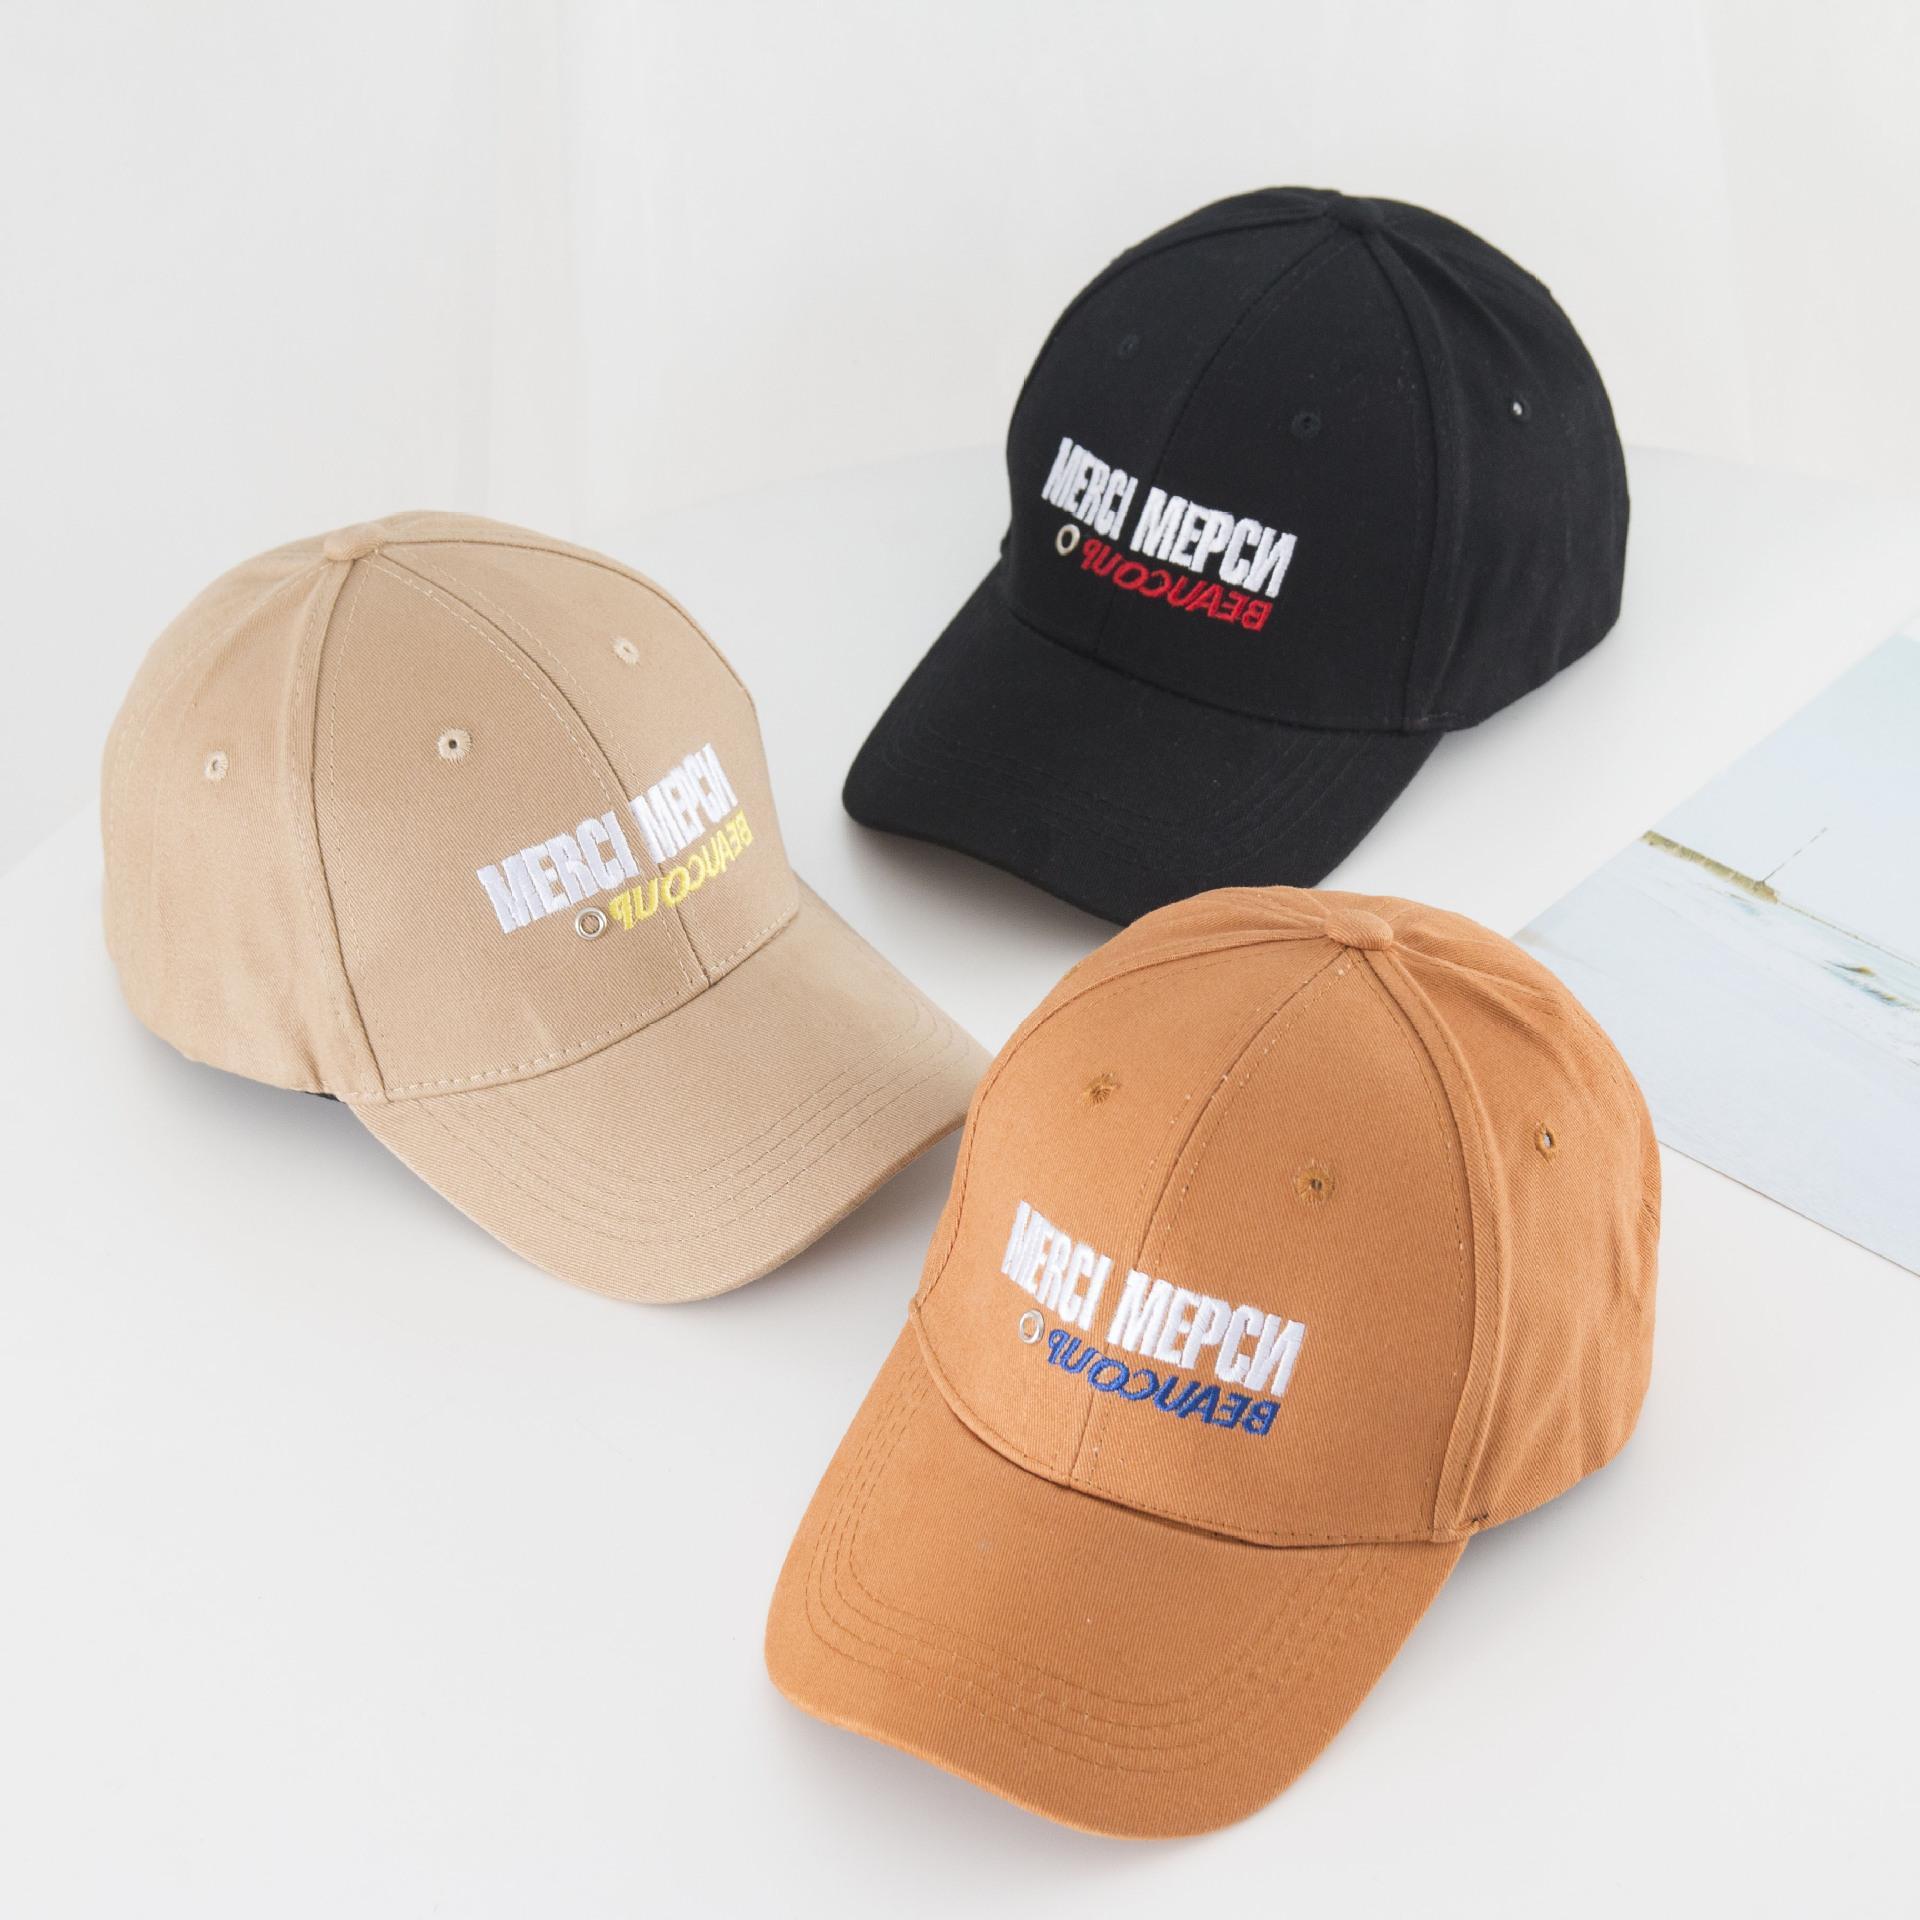 2018 Black Adult Unisex Casual Solid Adjustable Letter Baseball Caps ... 05c64afc3d8d